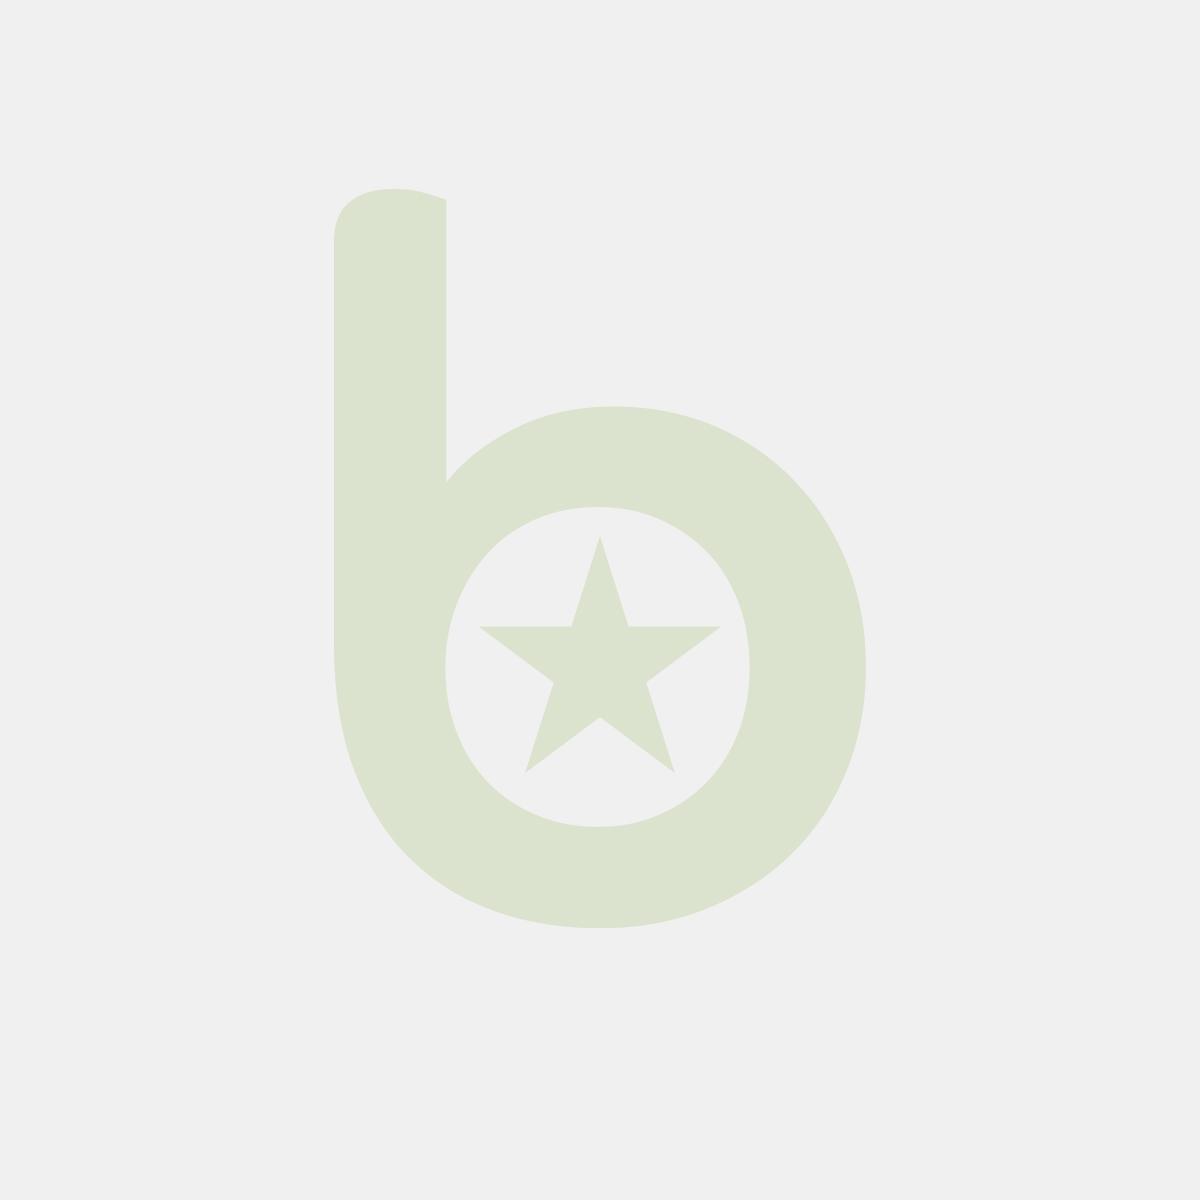 FINGERFOOD - garnek miedź/czerń 45ml okrągły, fi.5x8,9xh.3,1cm, PS op. 24 sztuki